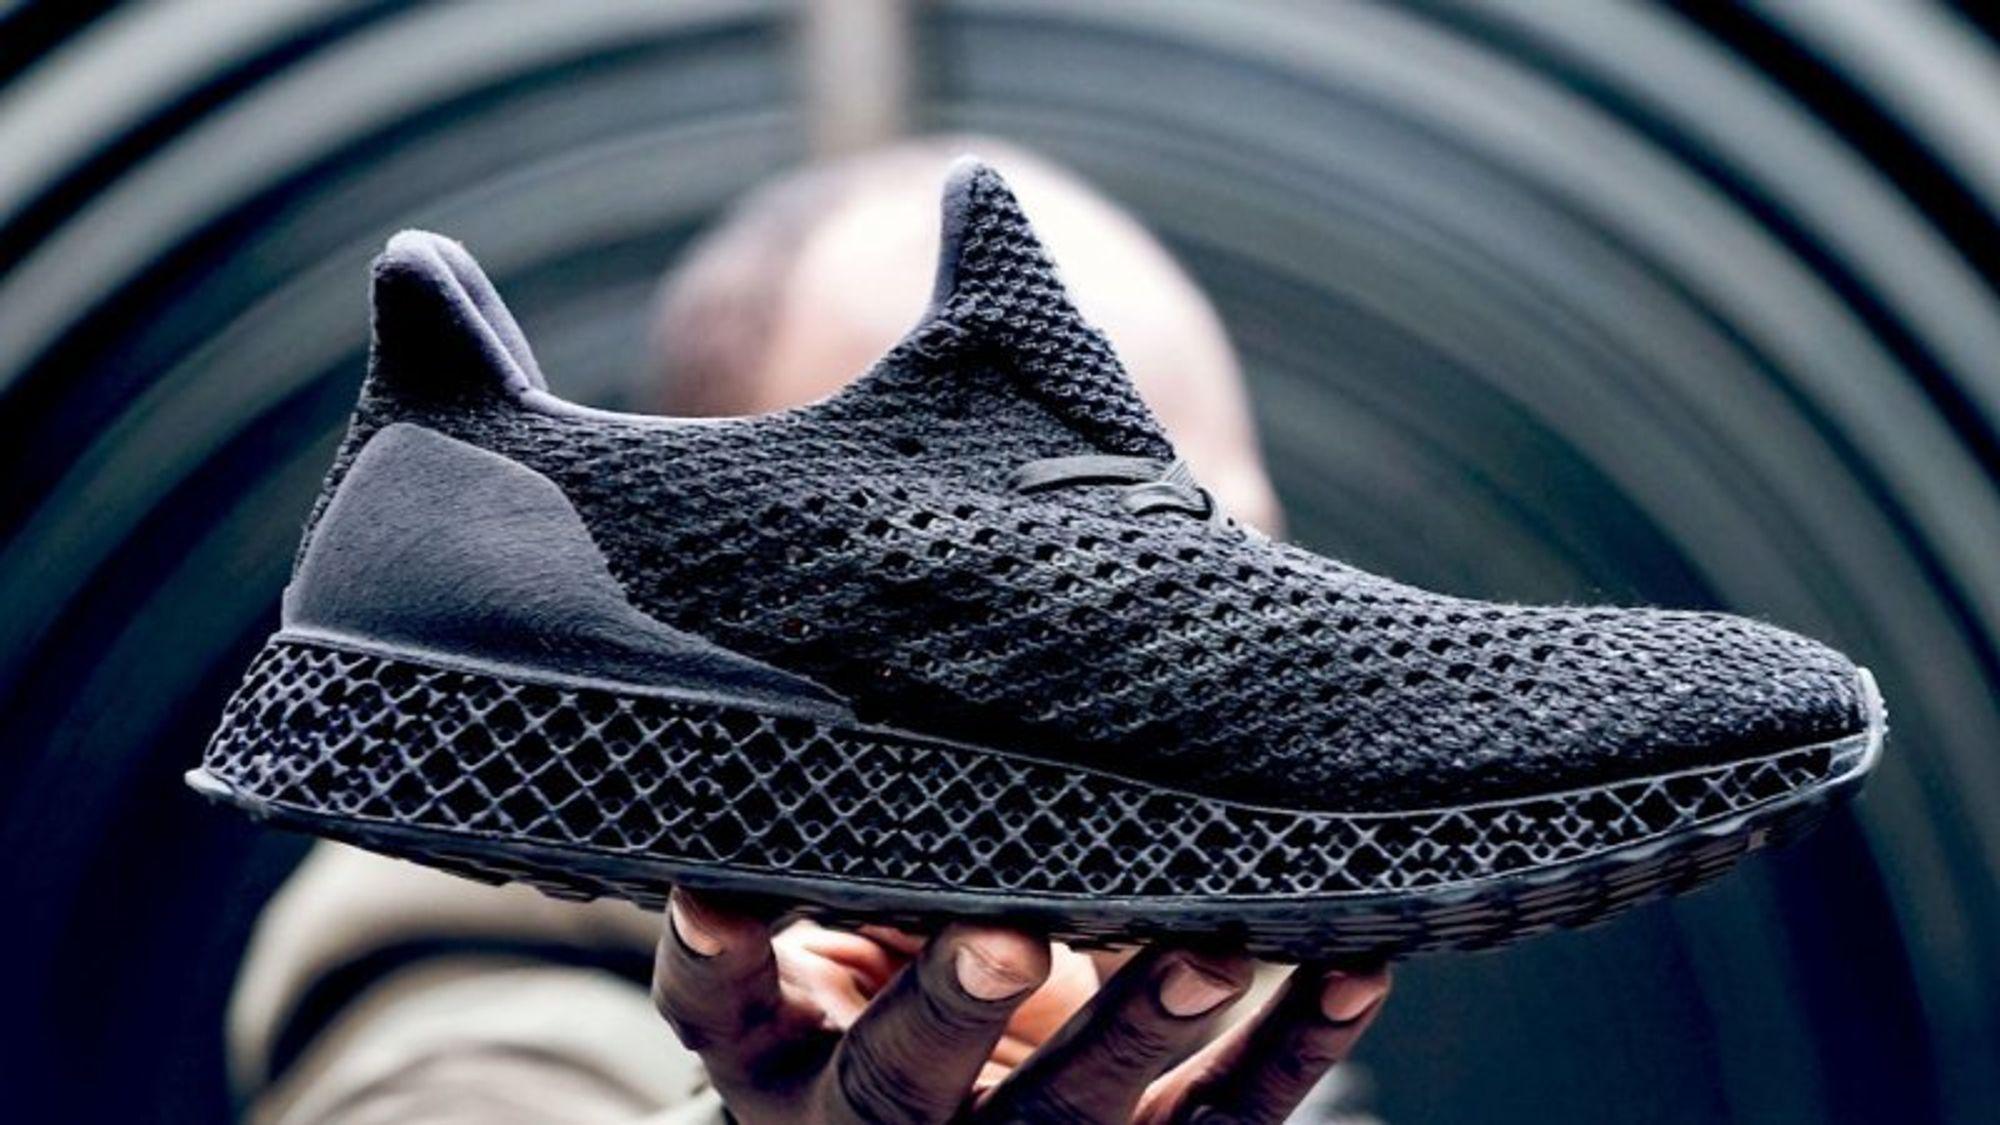 Adidas vil masseprodusere 3D printede sko Tu.no